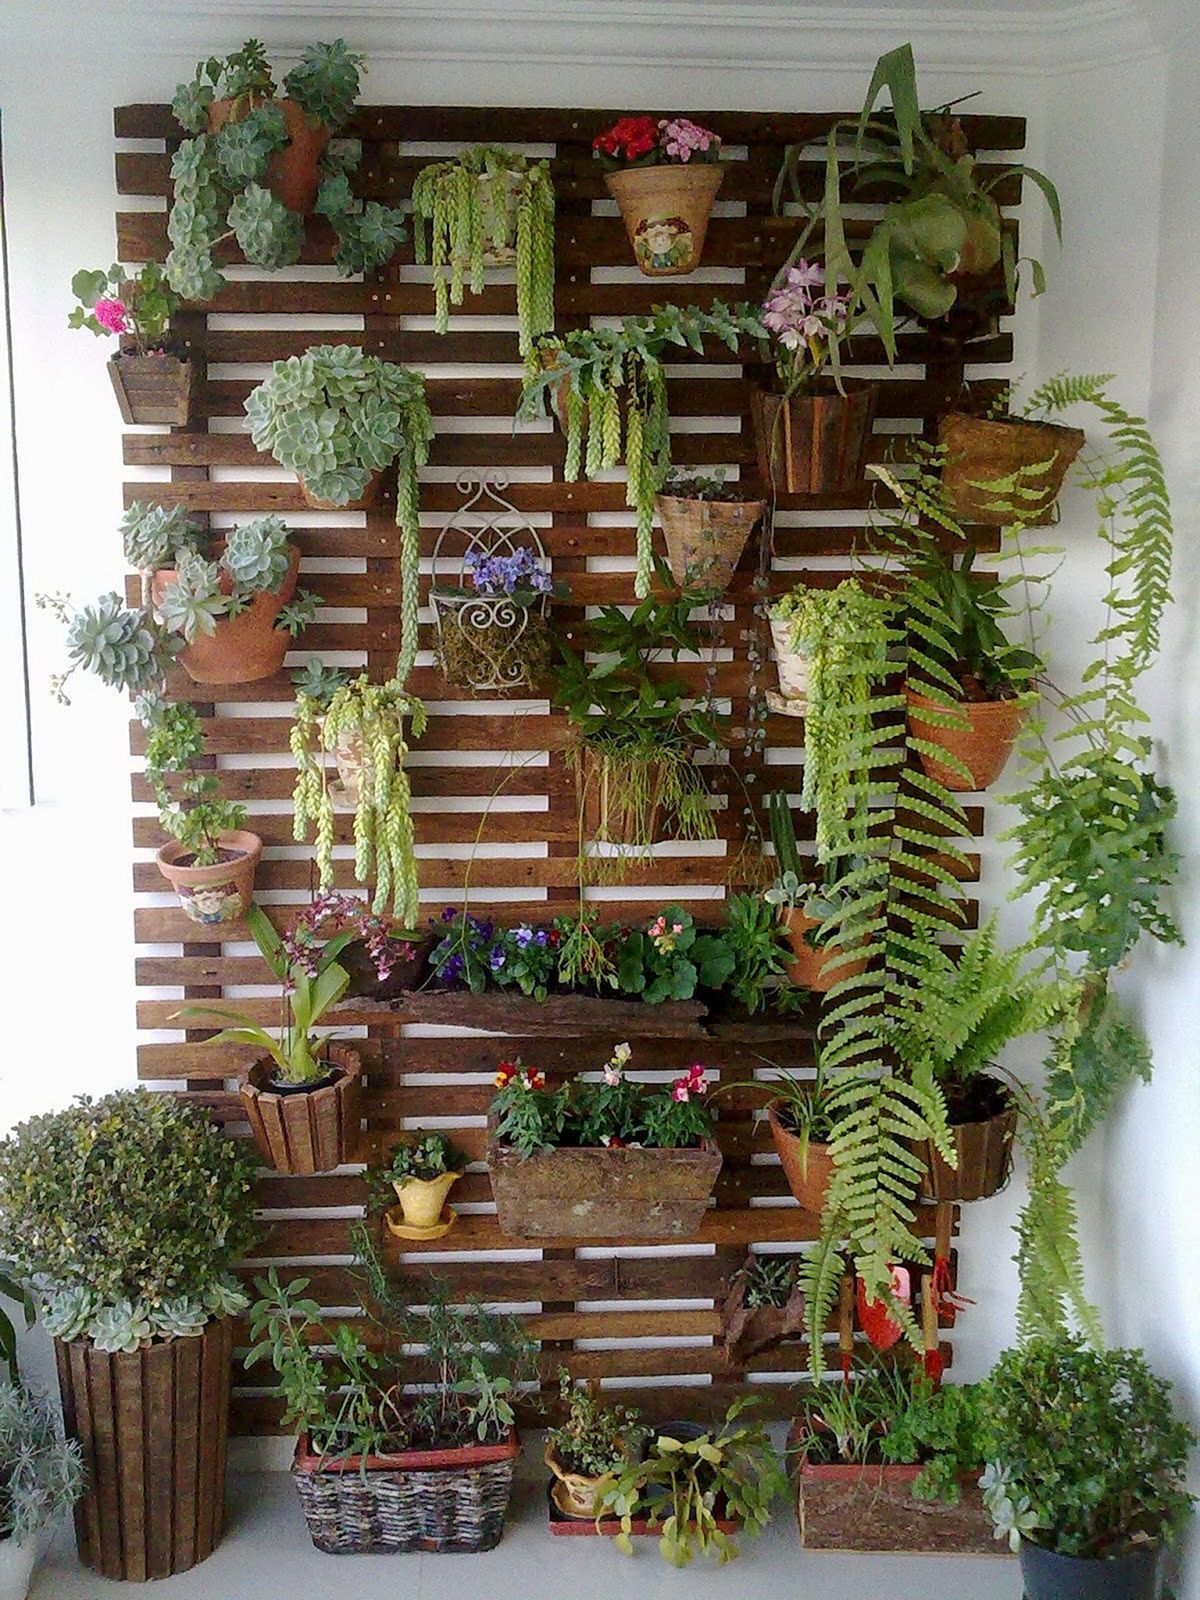 Awesome Container Garden With Succulents 45 Best Design Ideas Freshouz Com In 2020 Vertical Garden Backyard Patio